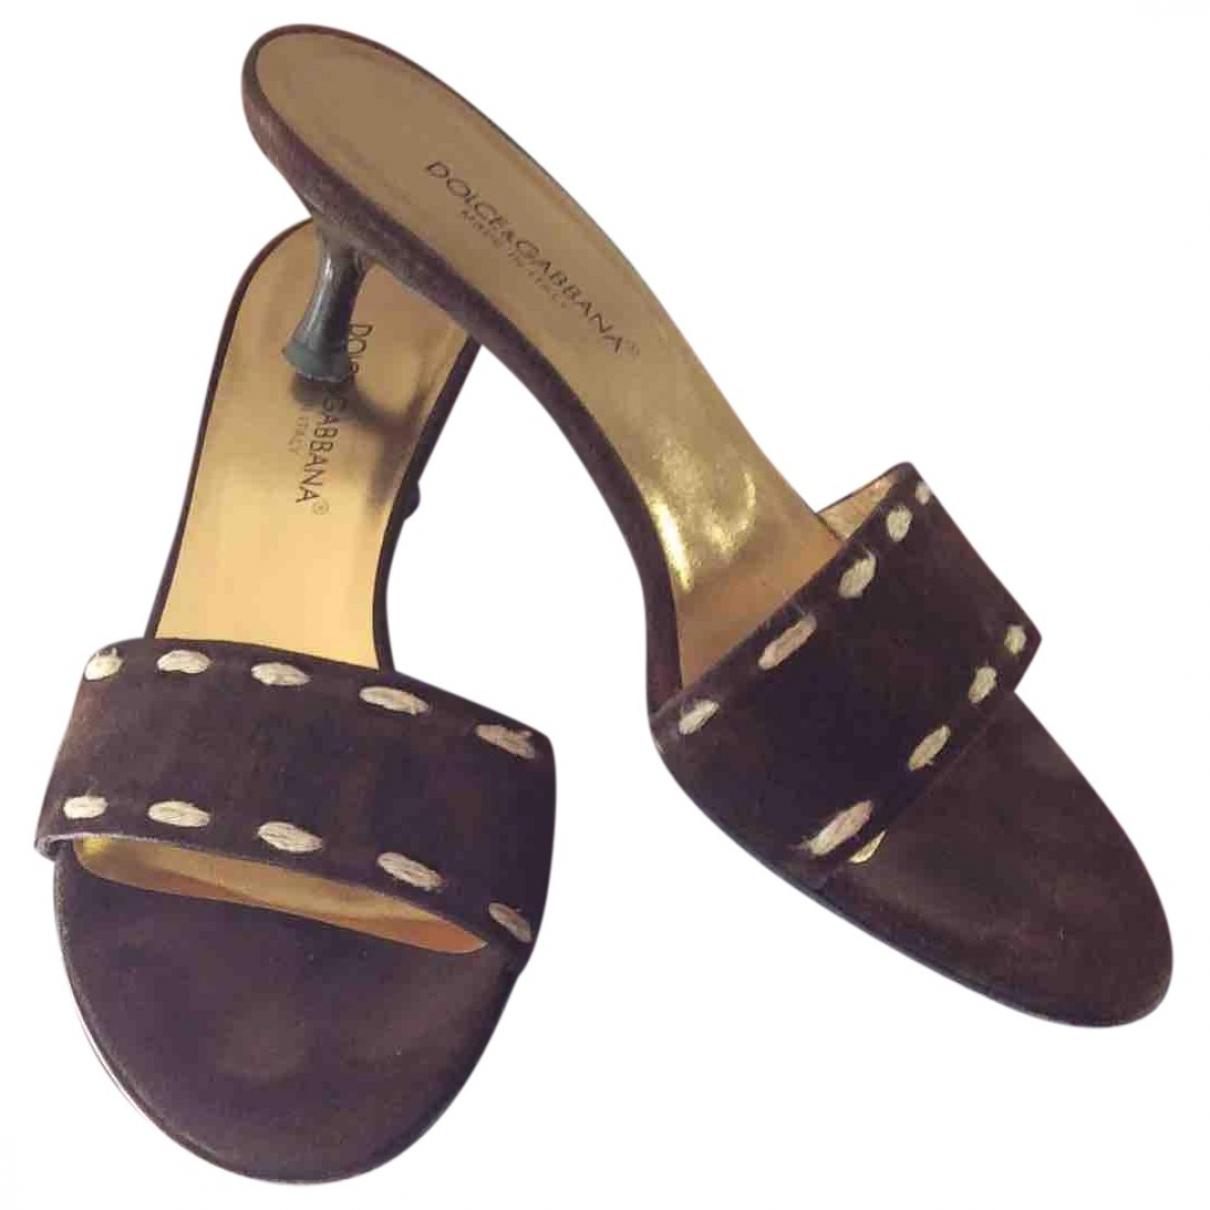 Dolce & Gabbana \N Brown Suede Sandals for Women 37.5 EU